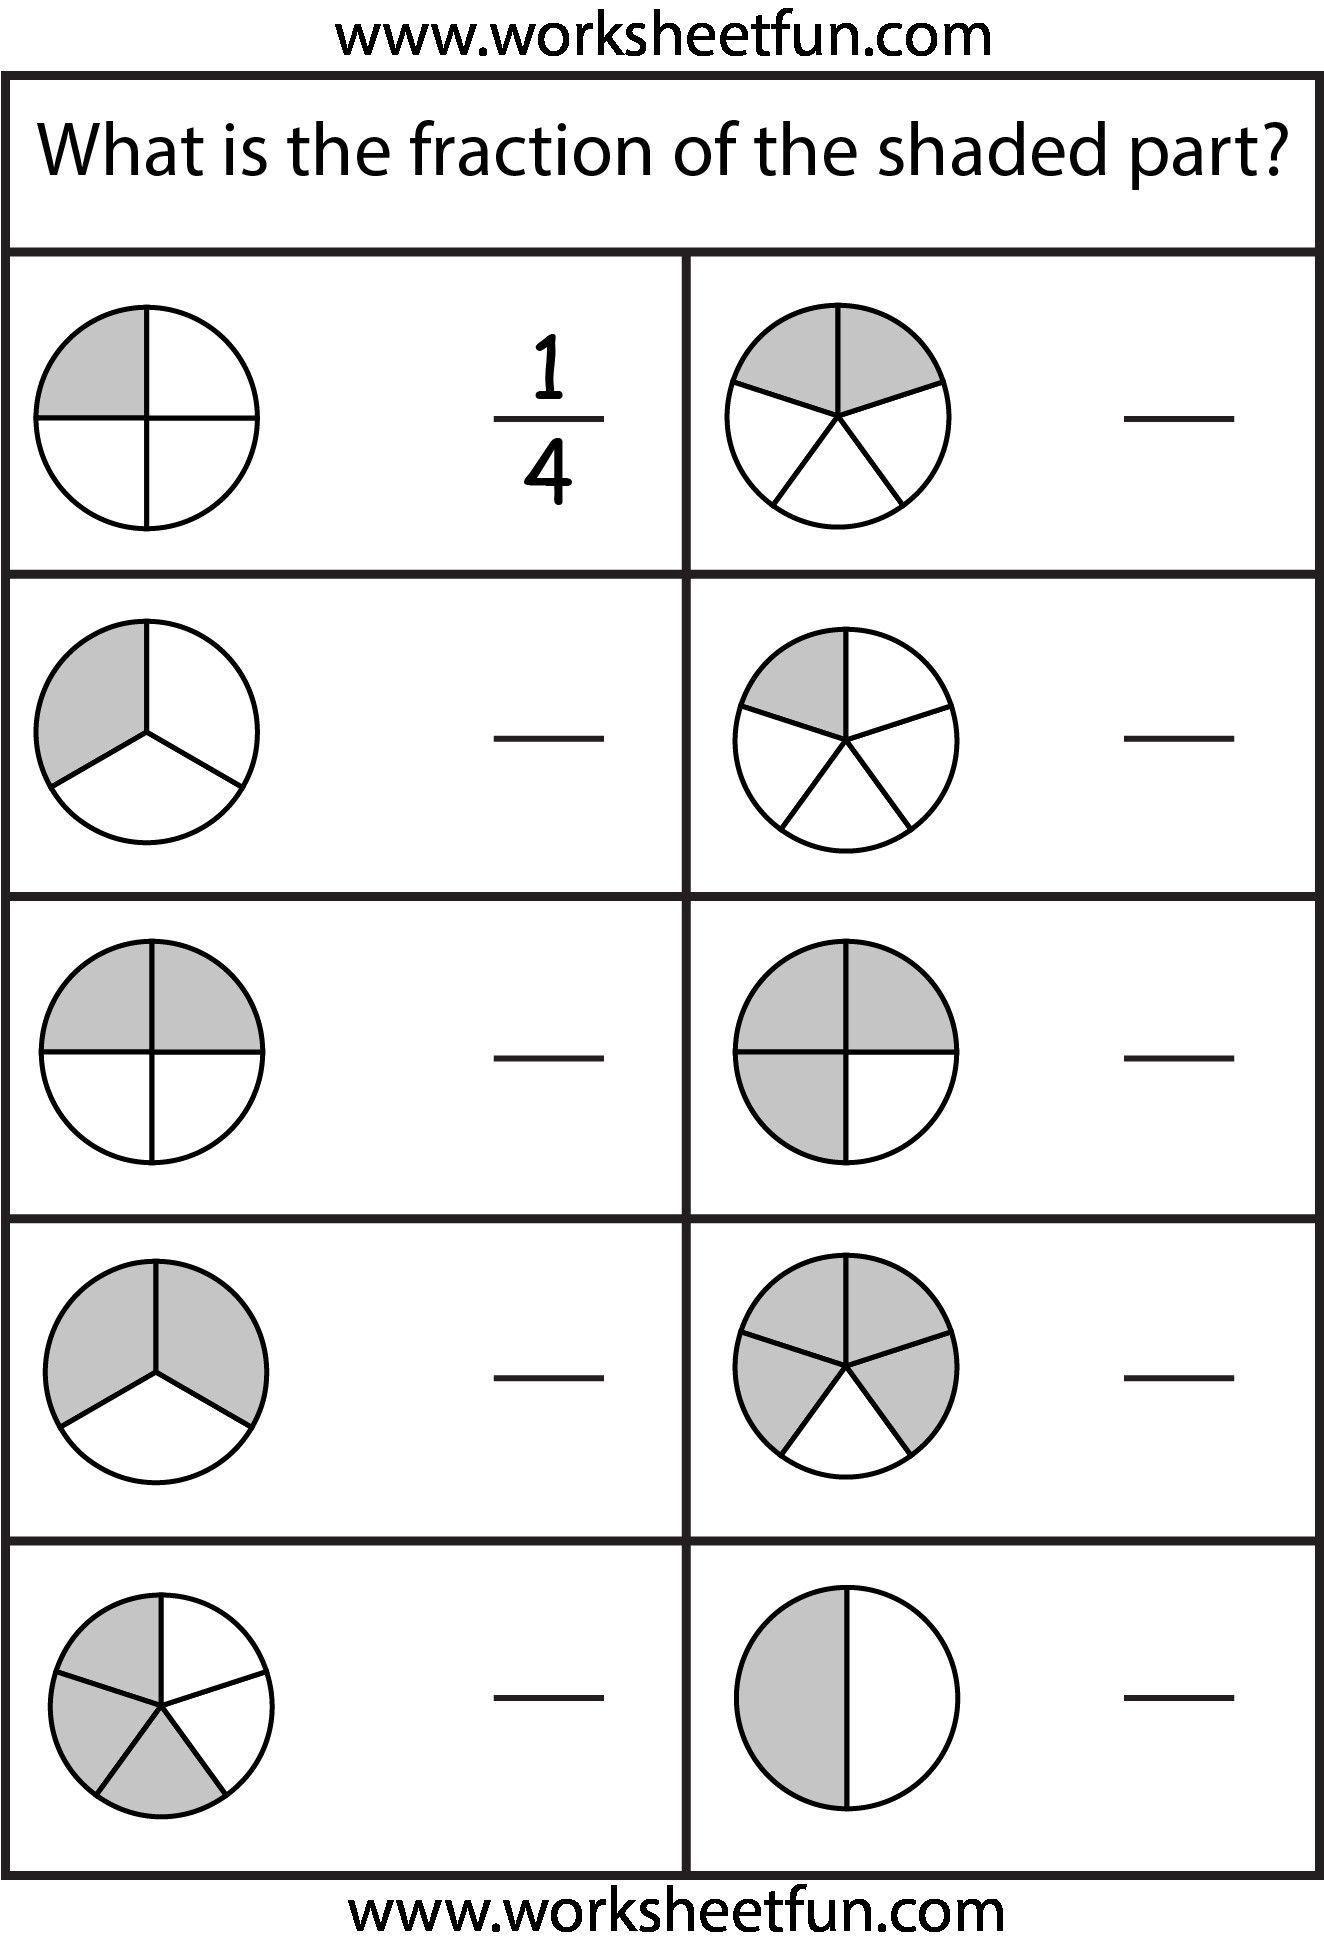 Third Grade Fraction Worksheets In 2020 Math Fractions Worksheets 2nd Grade Math Worksheets Fractions Worksheets